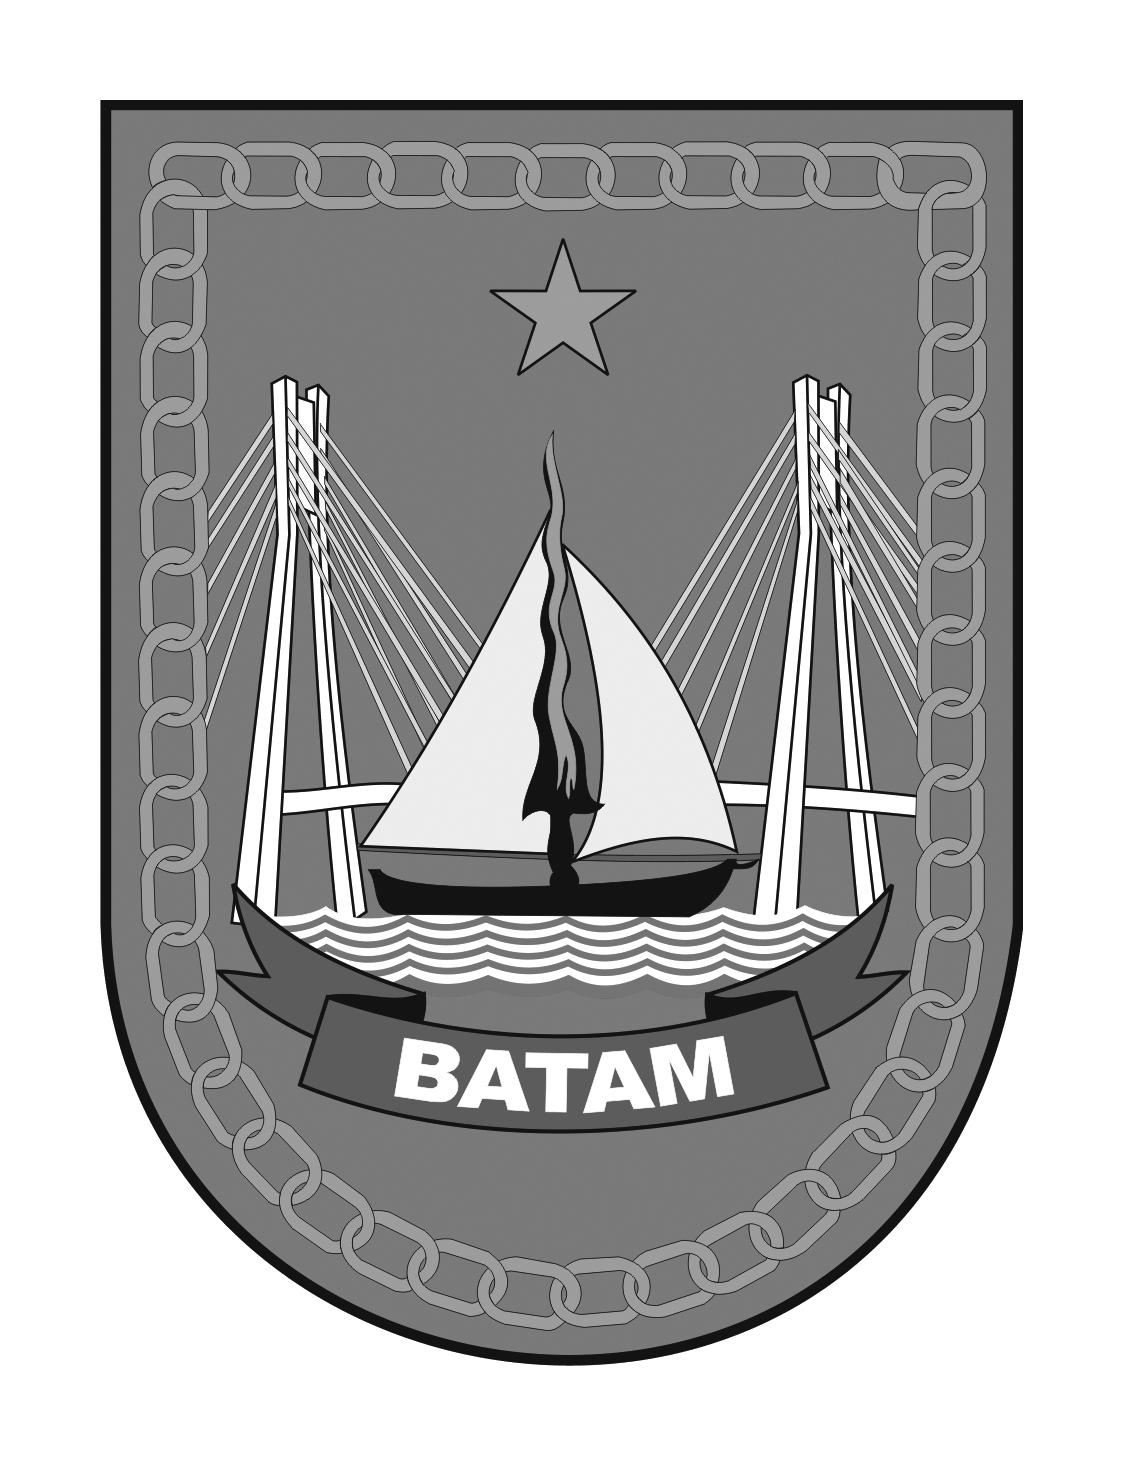 Logo Kota Batam (Provinsi Kepulauan Riau) Original Grayscale